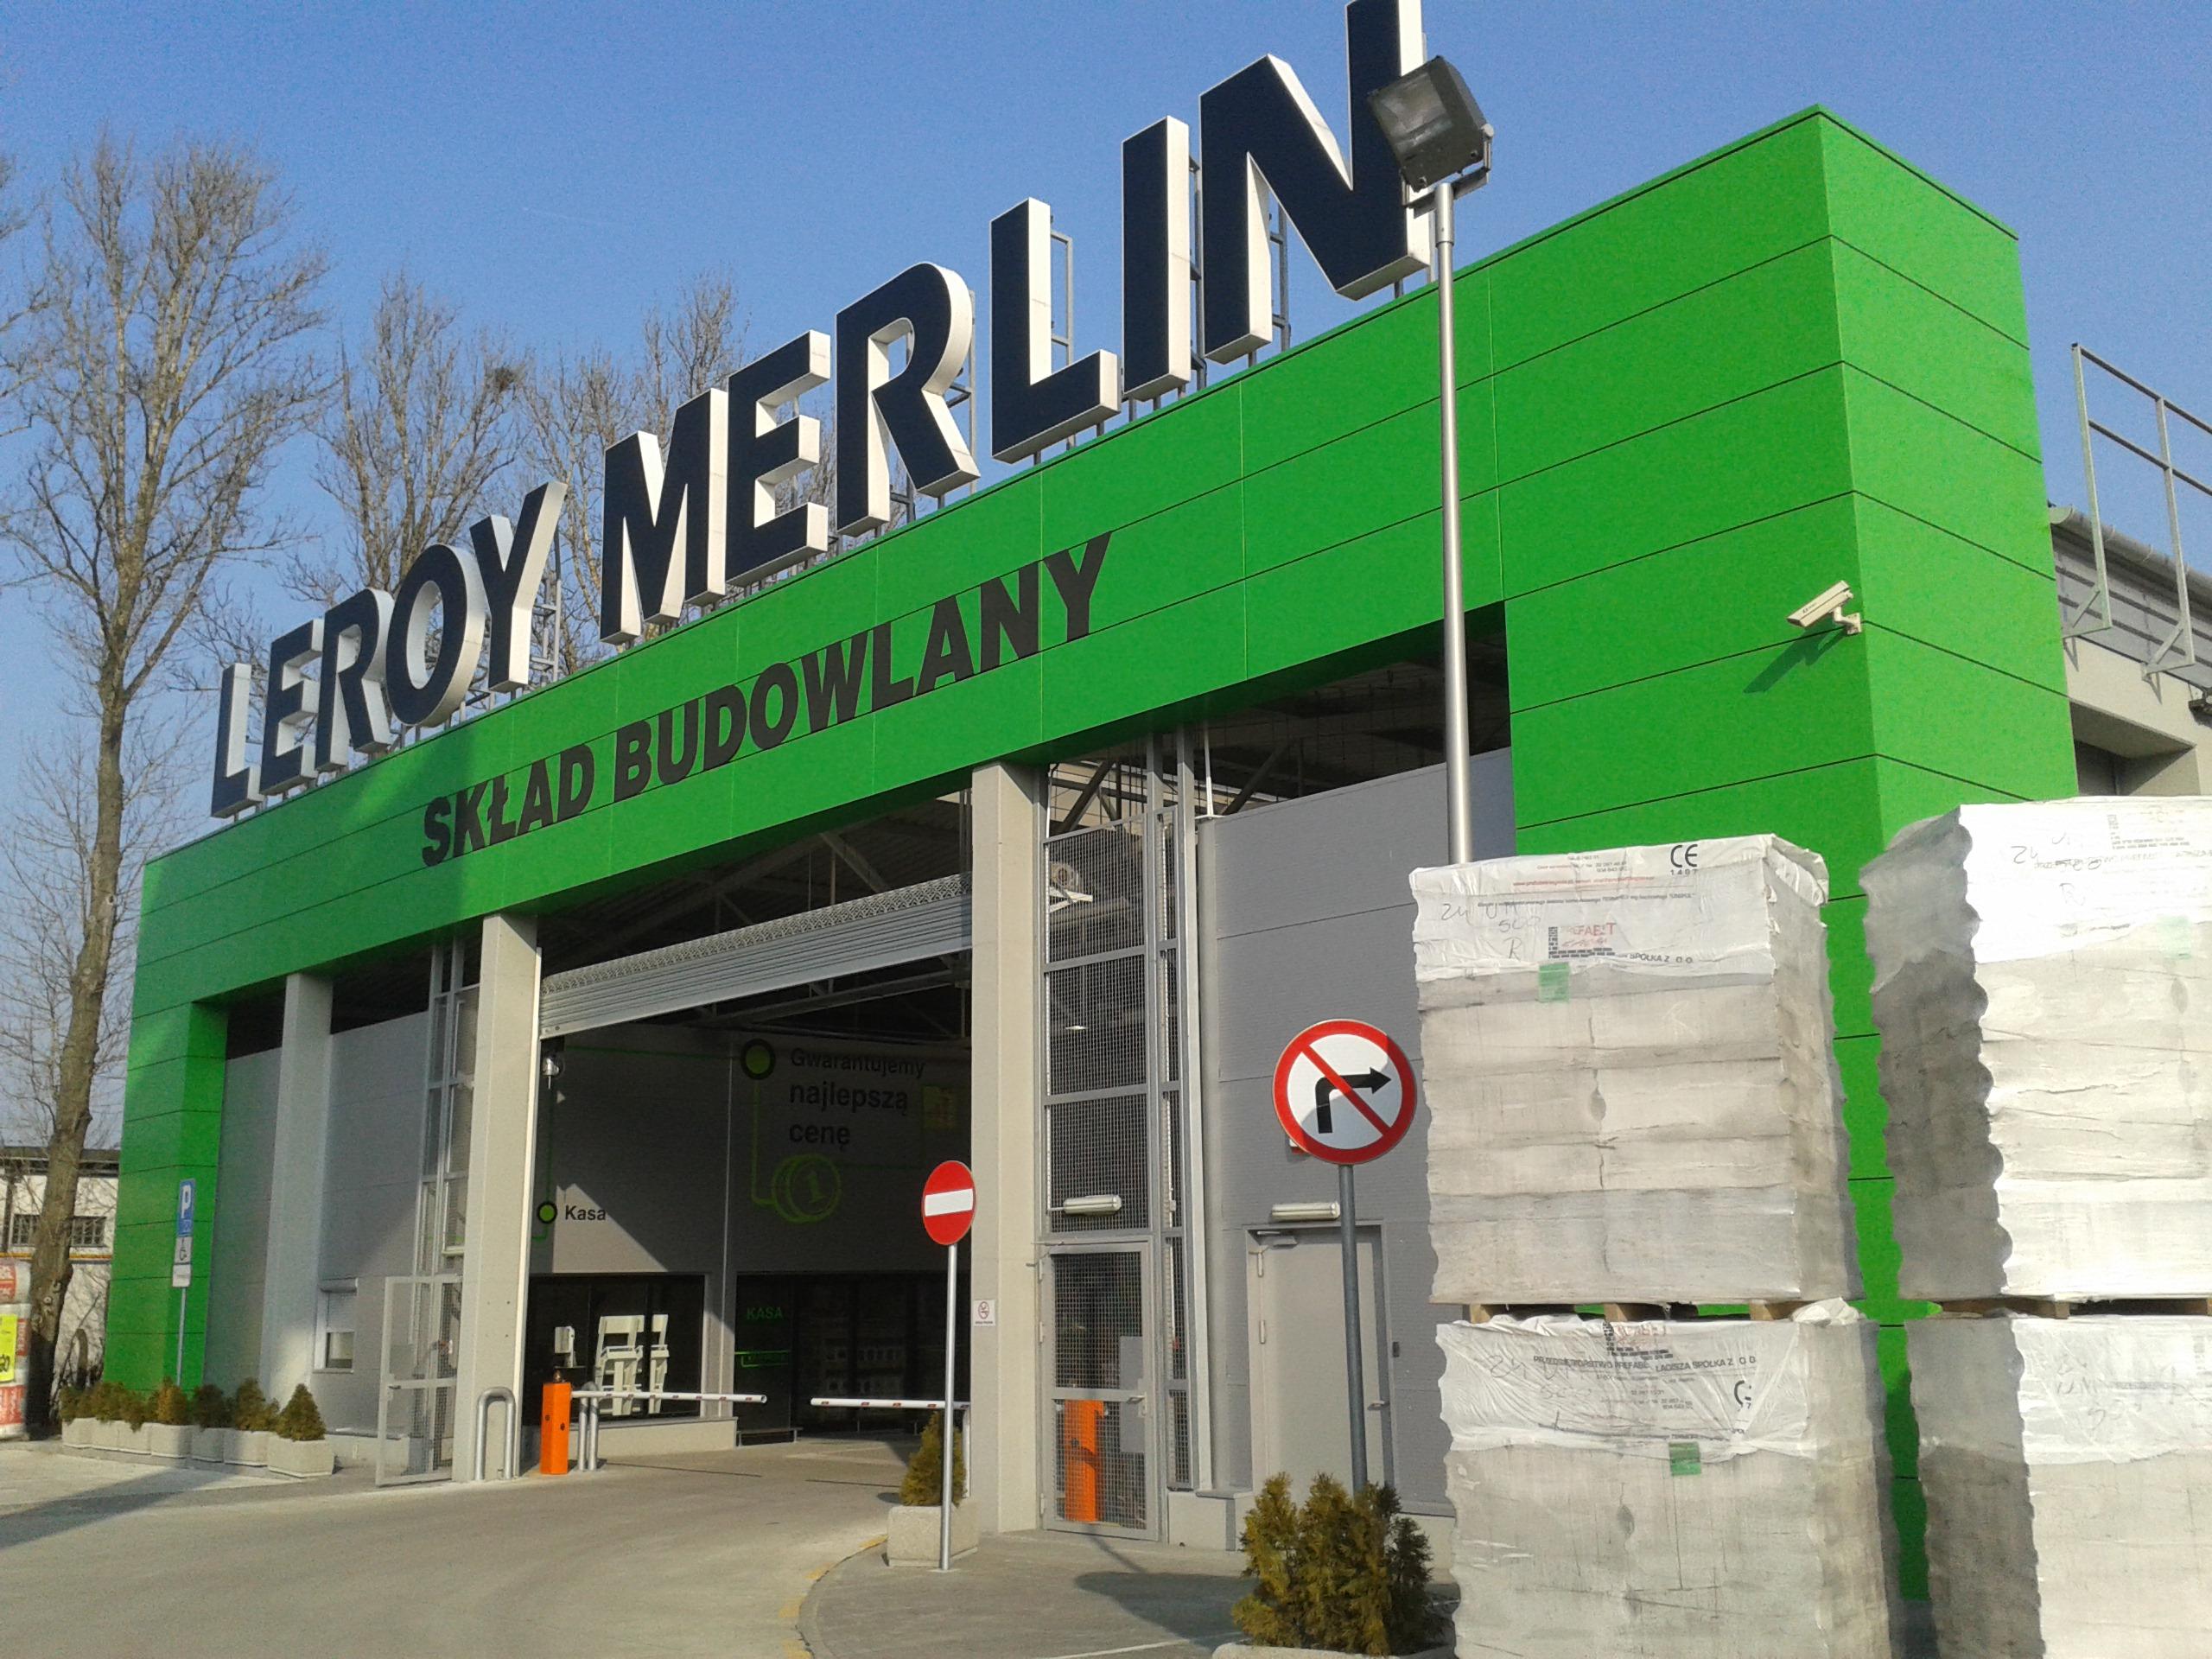 Leroy Merlin Sklad Budowlany Lublin